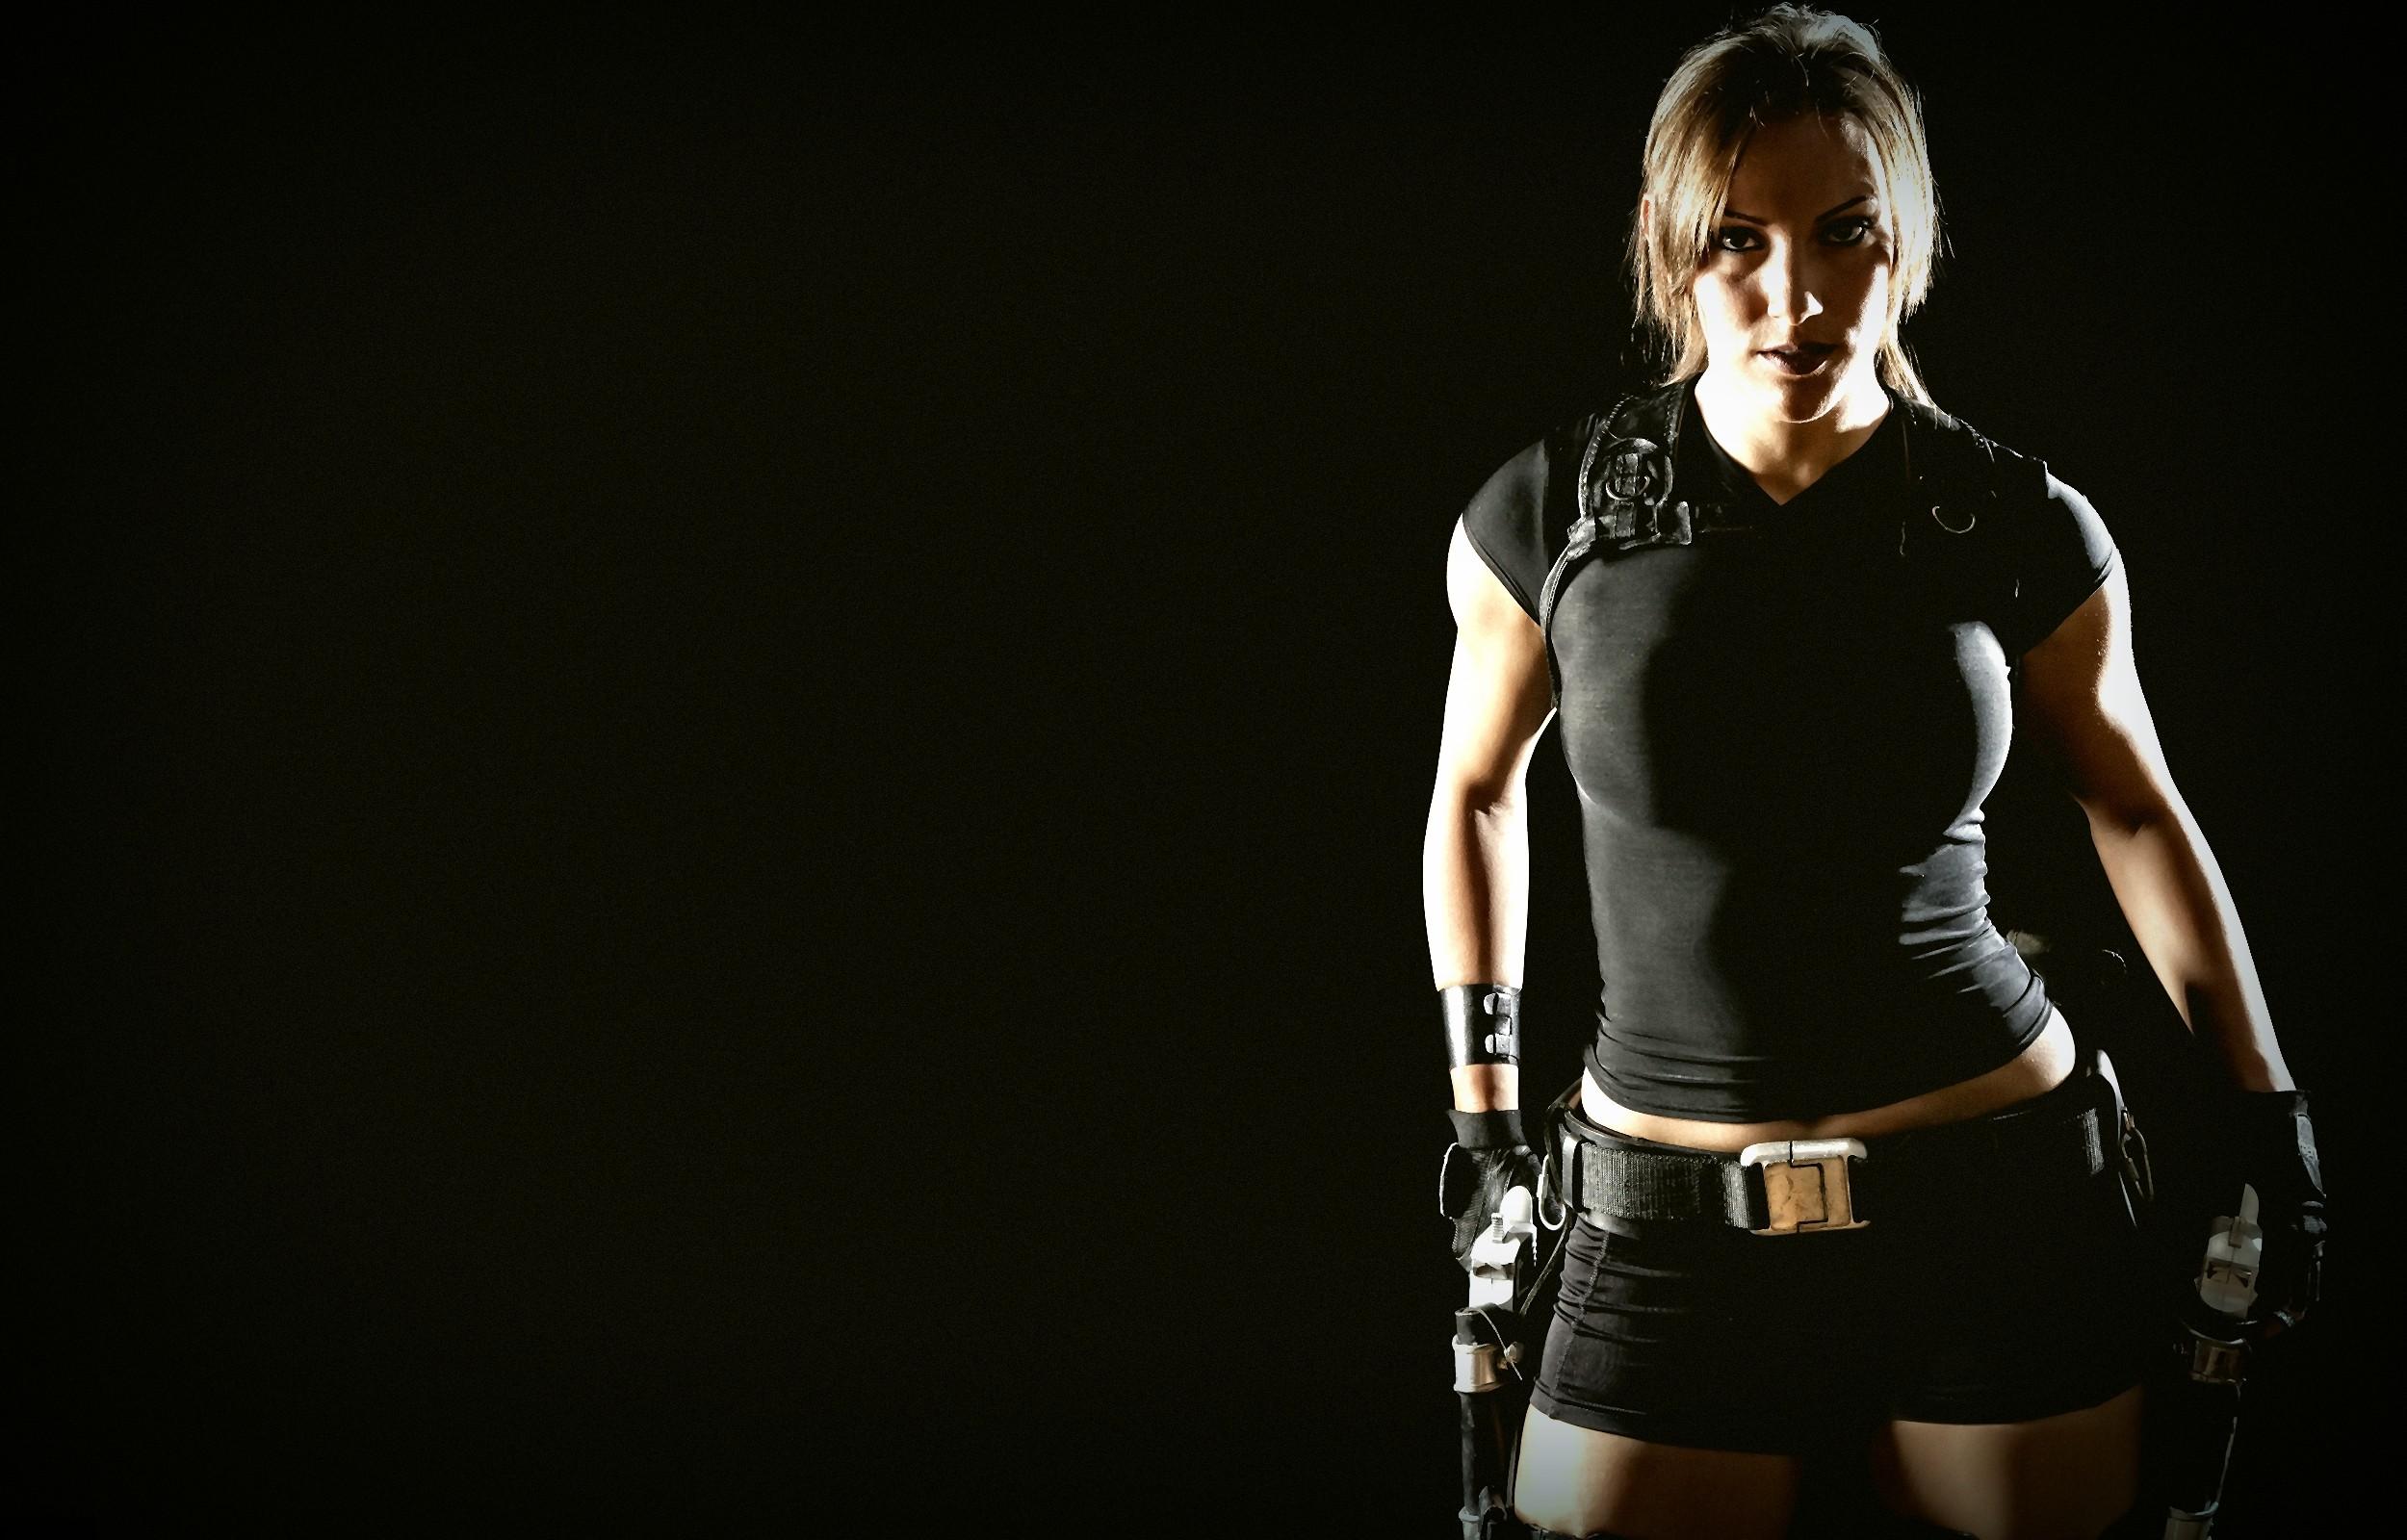 Tomb Raider Underworld 2 by JennCroft on deviantART | Croft